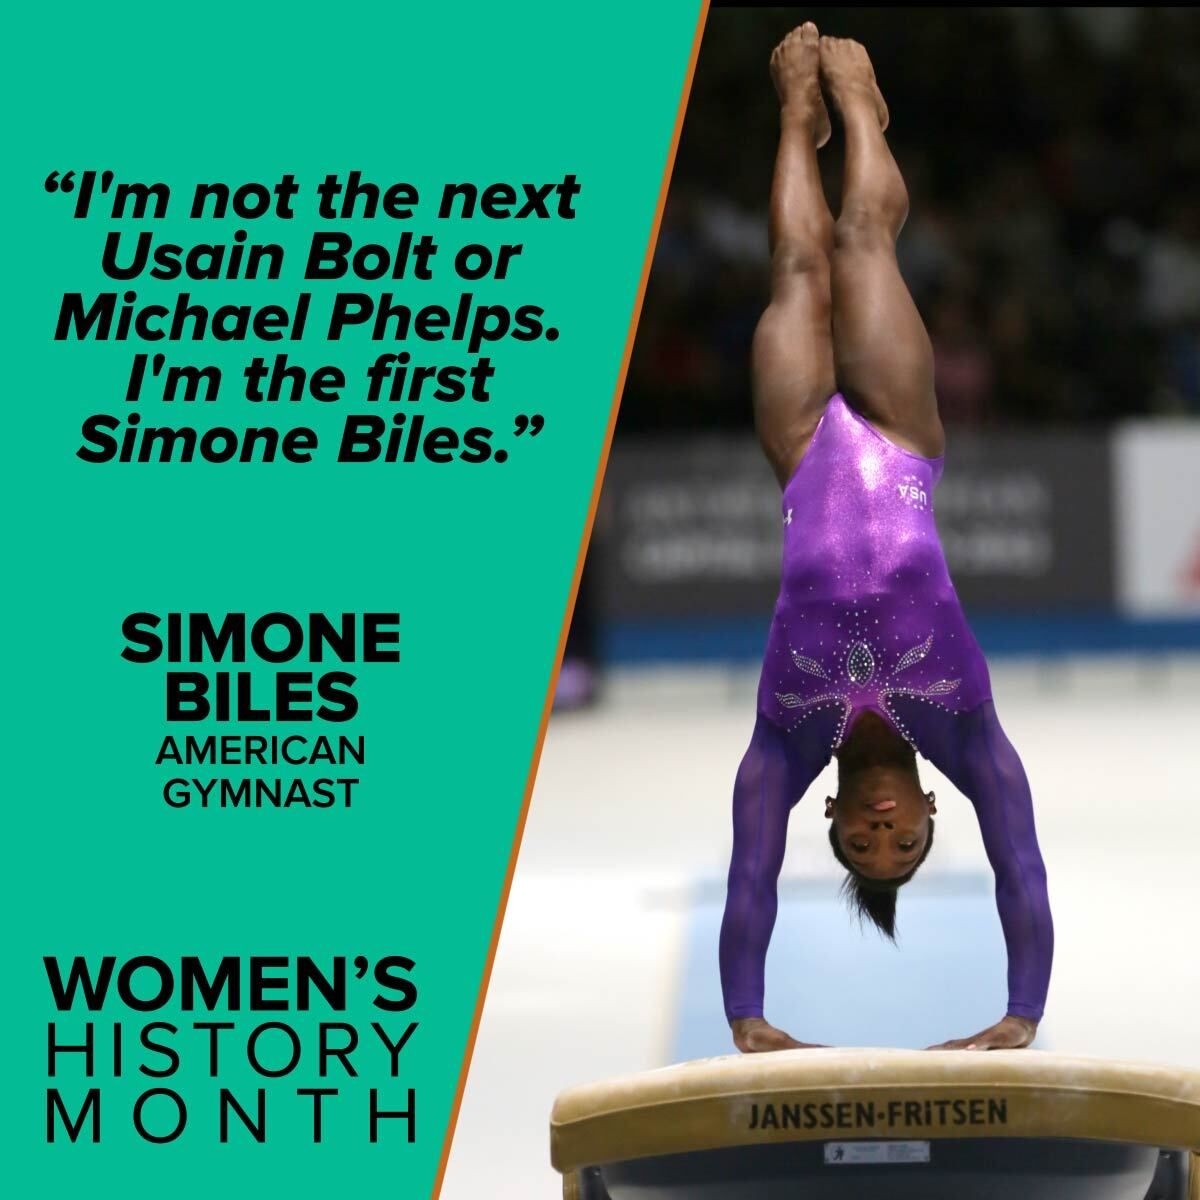 Women's History Month_simone biles .jpg